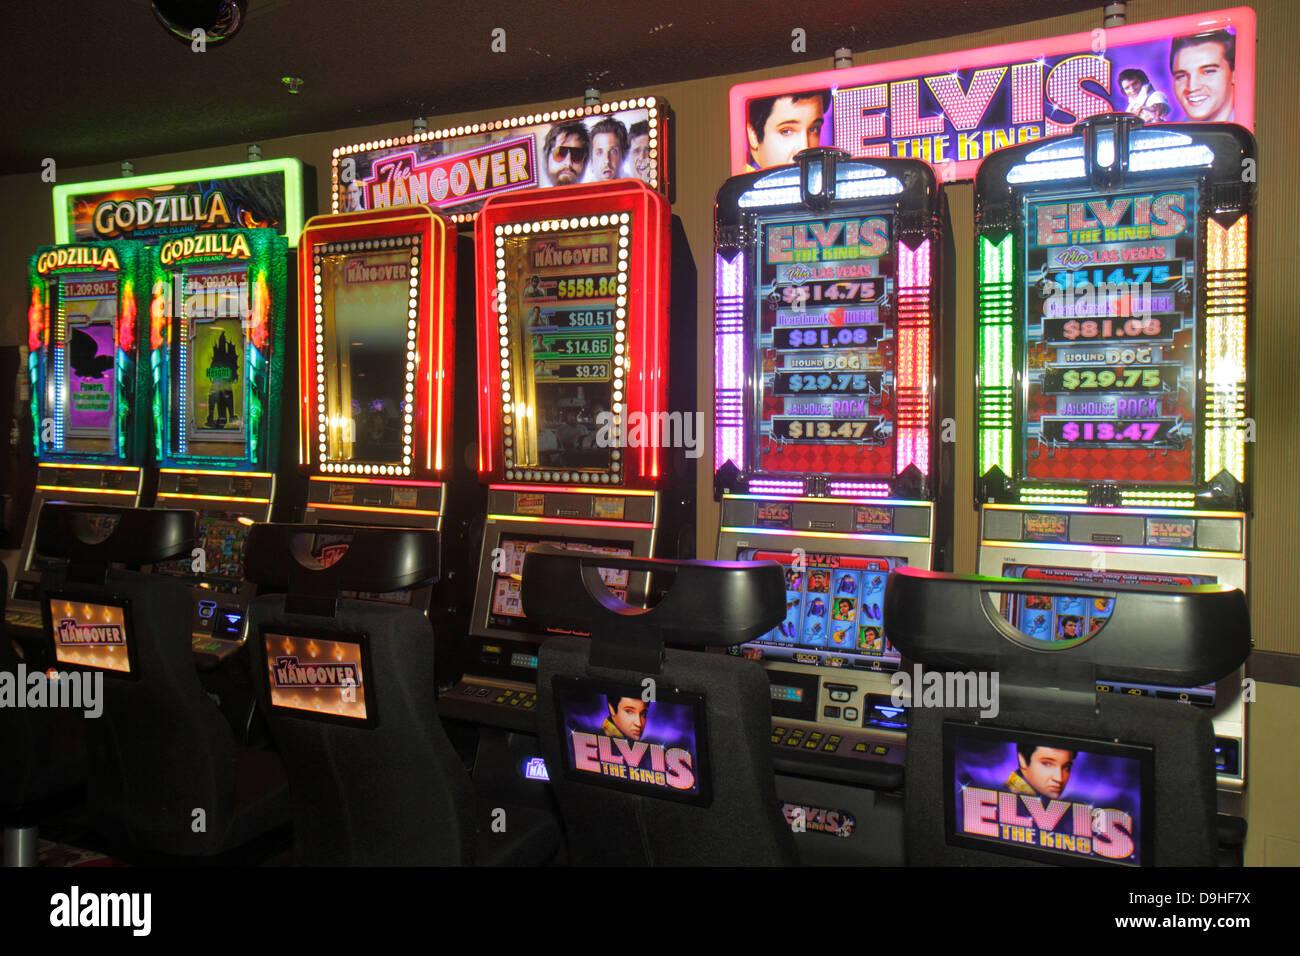 Casino gamble slot strip vegas championship gambling odds